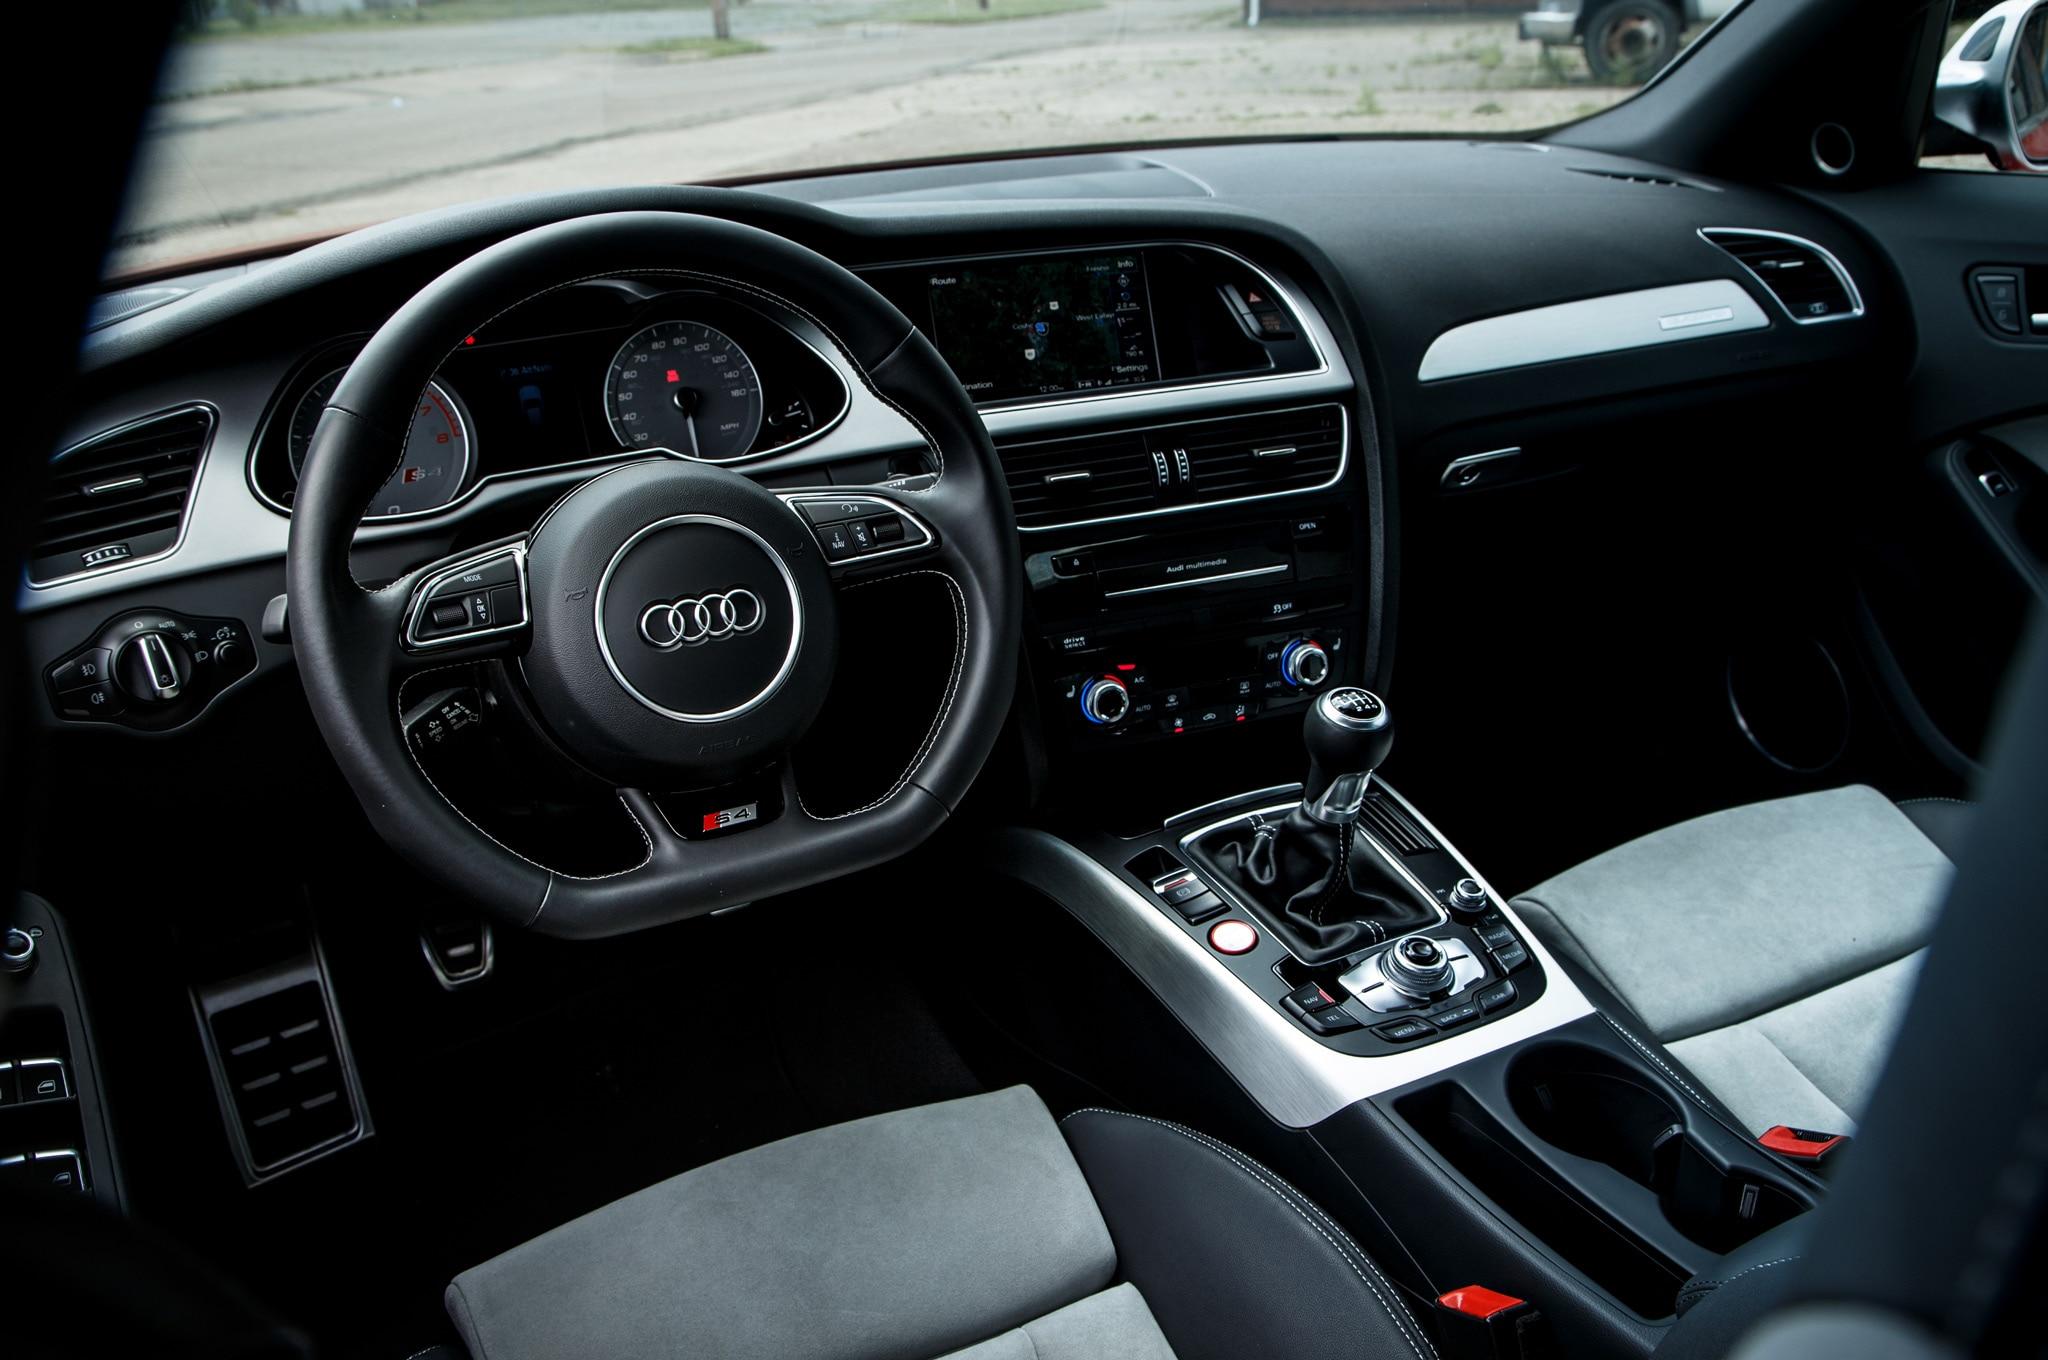 2017 audi s4 manual transmission